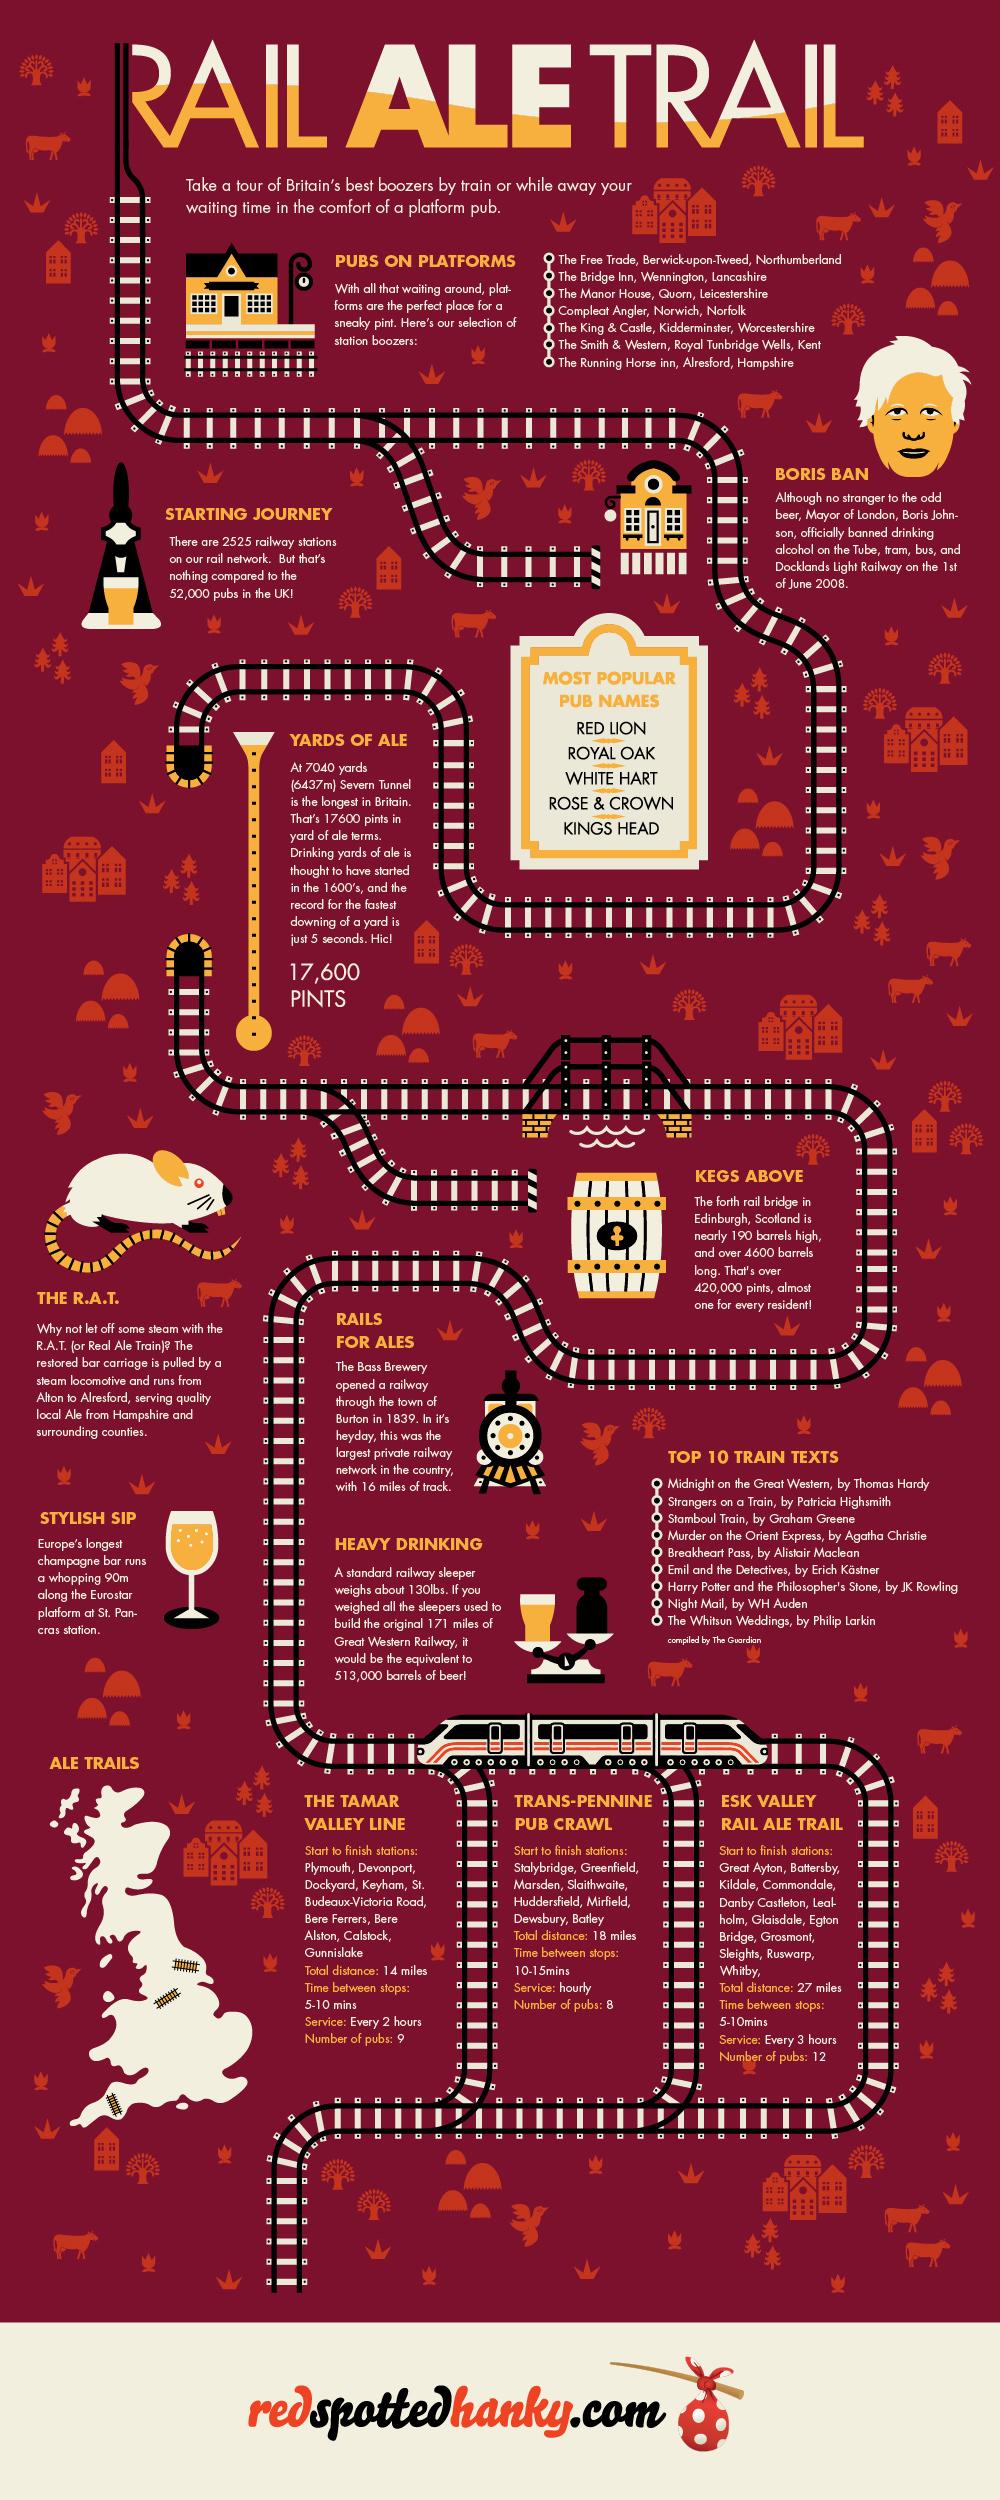 rail-ale-trail